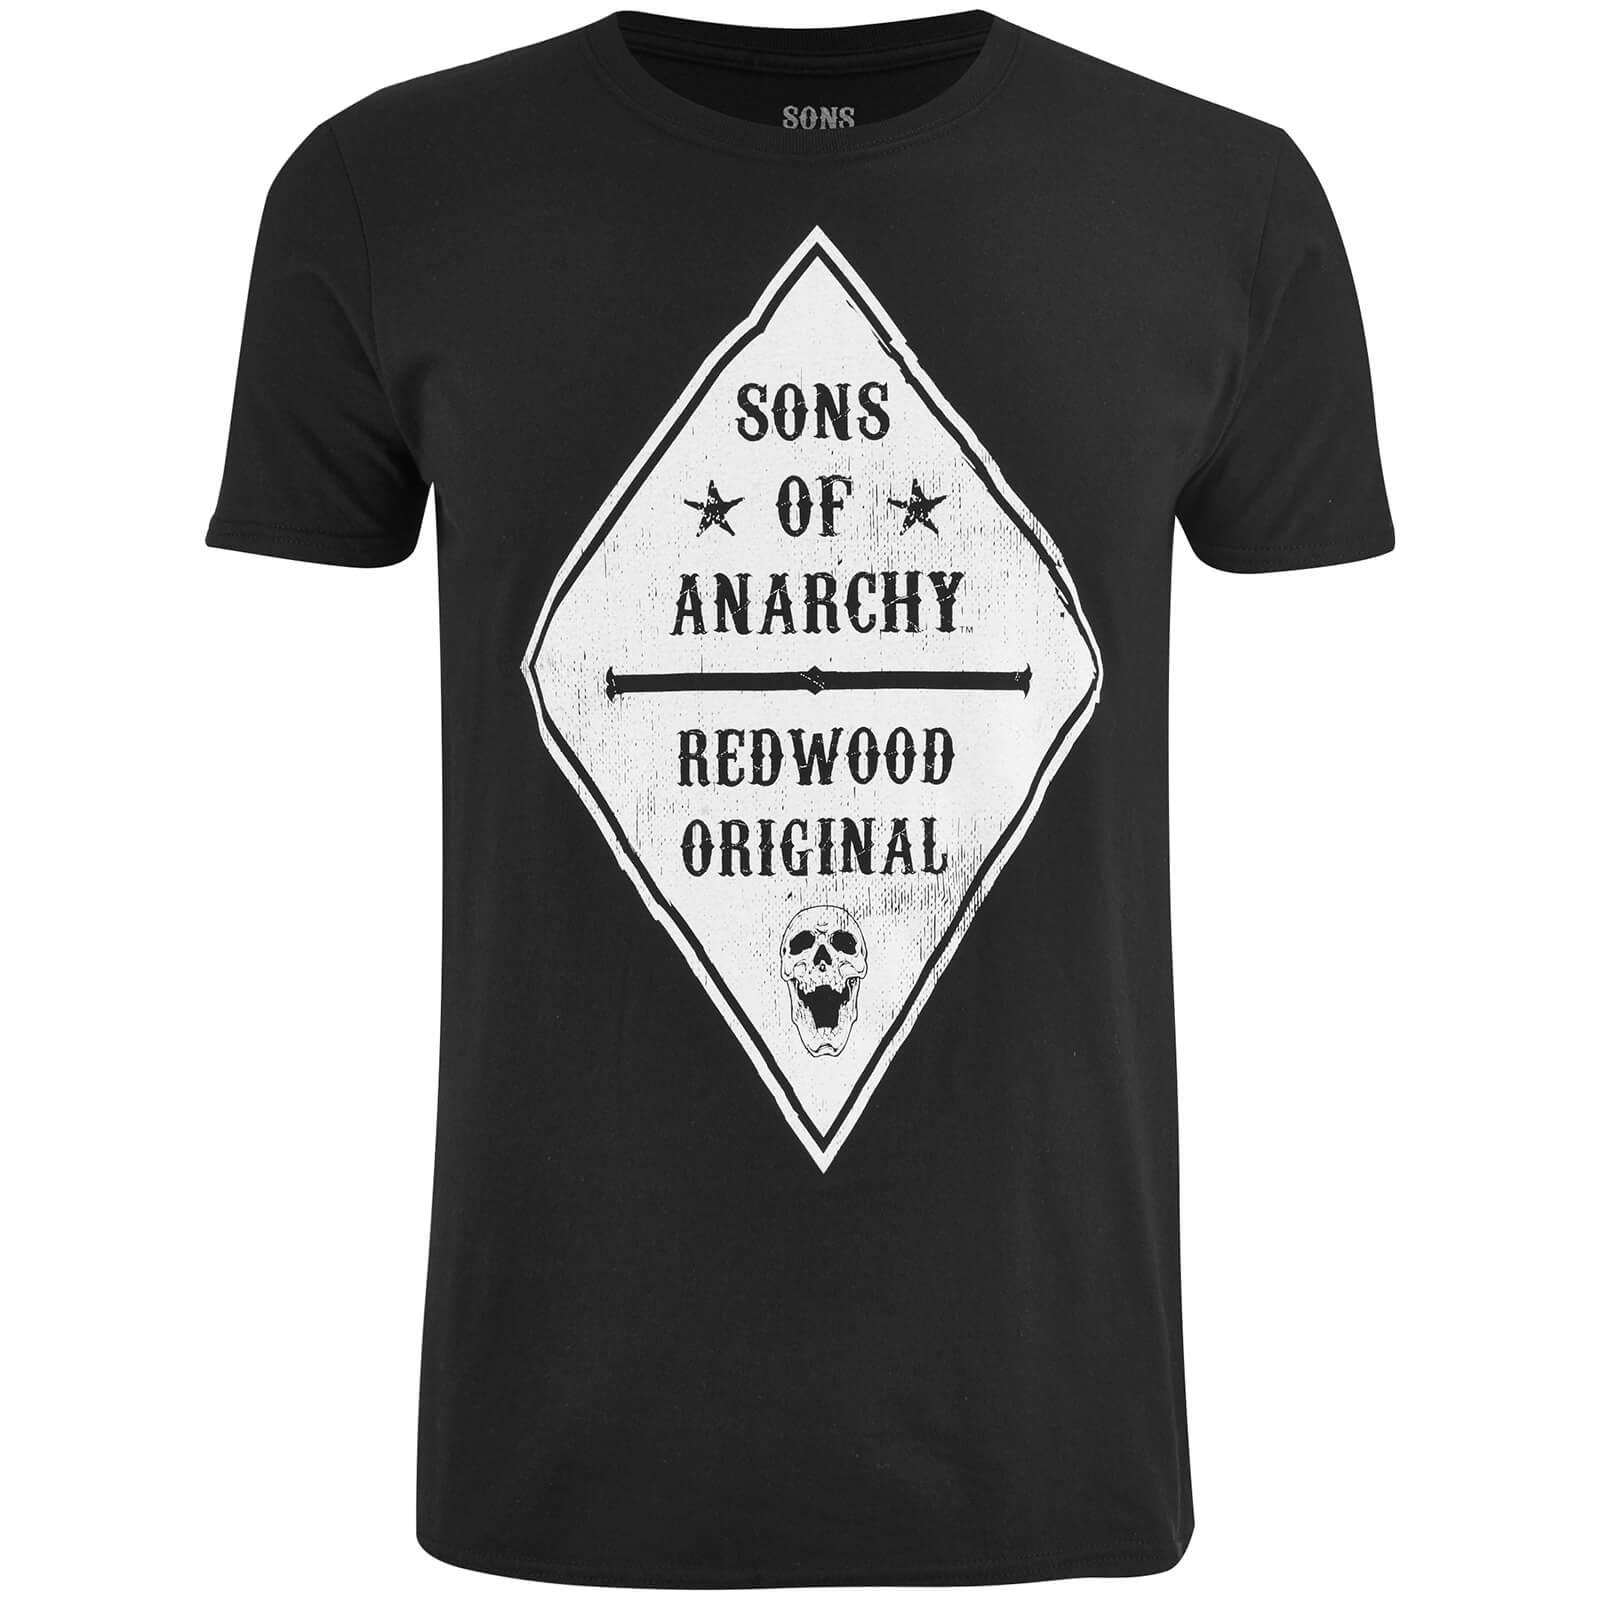 Sons Of Anarchy Männer Skull Club T Shirt Schwarz Merchandise